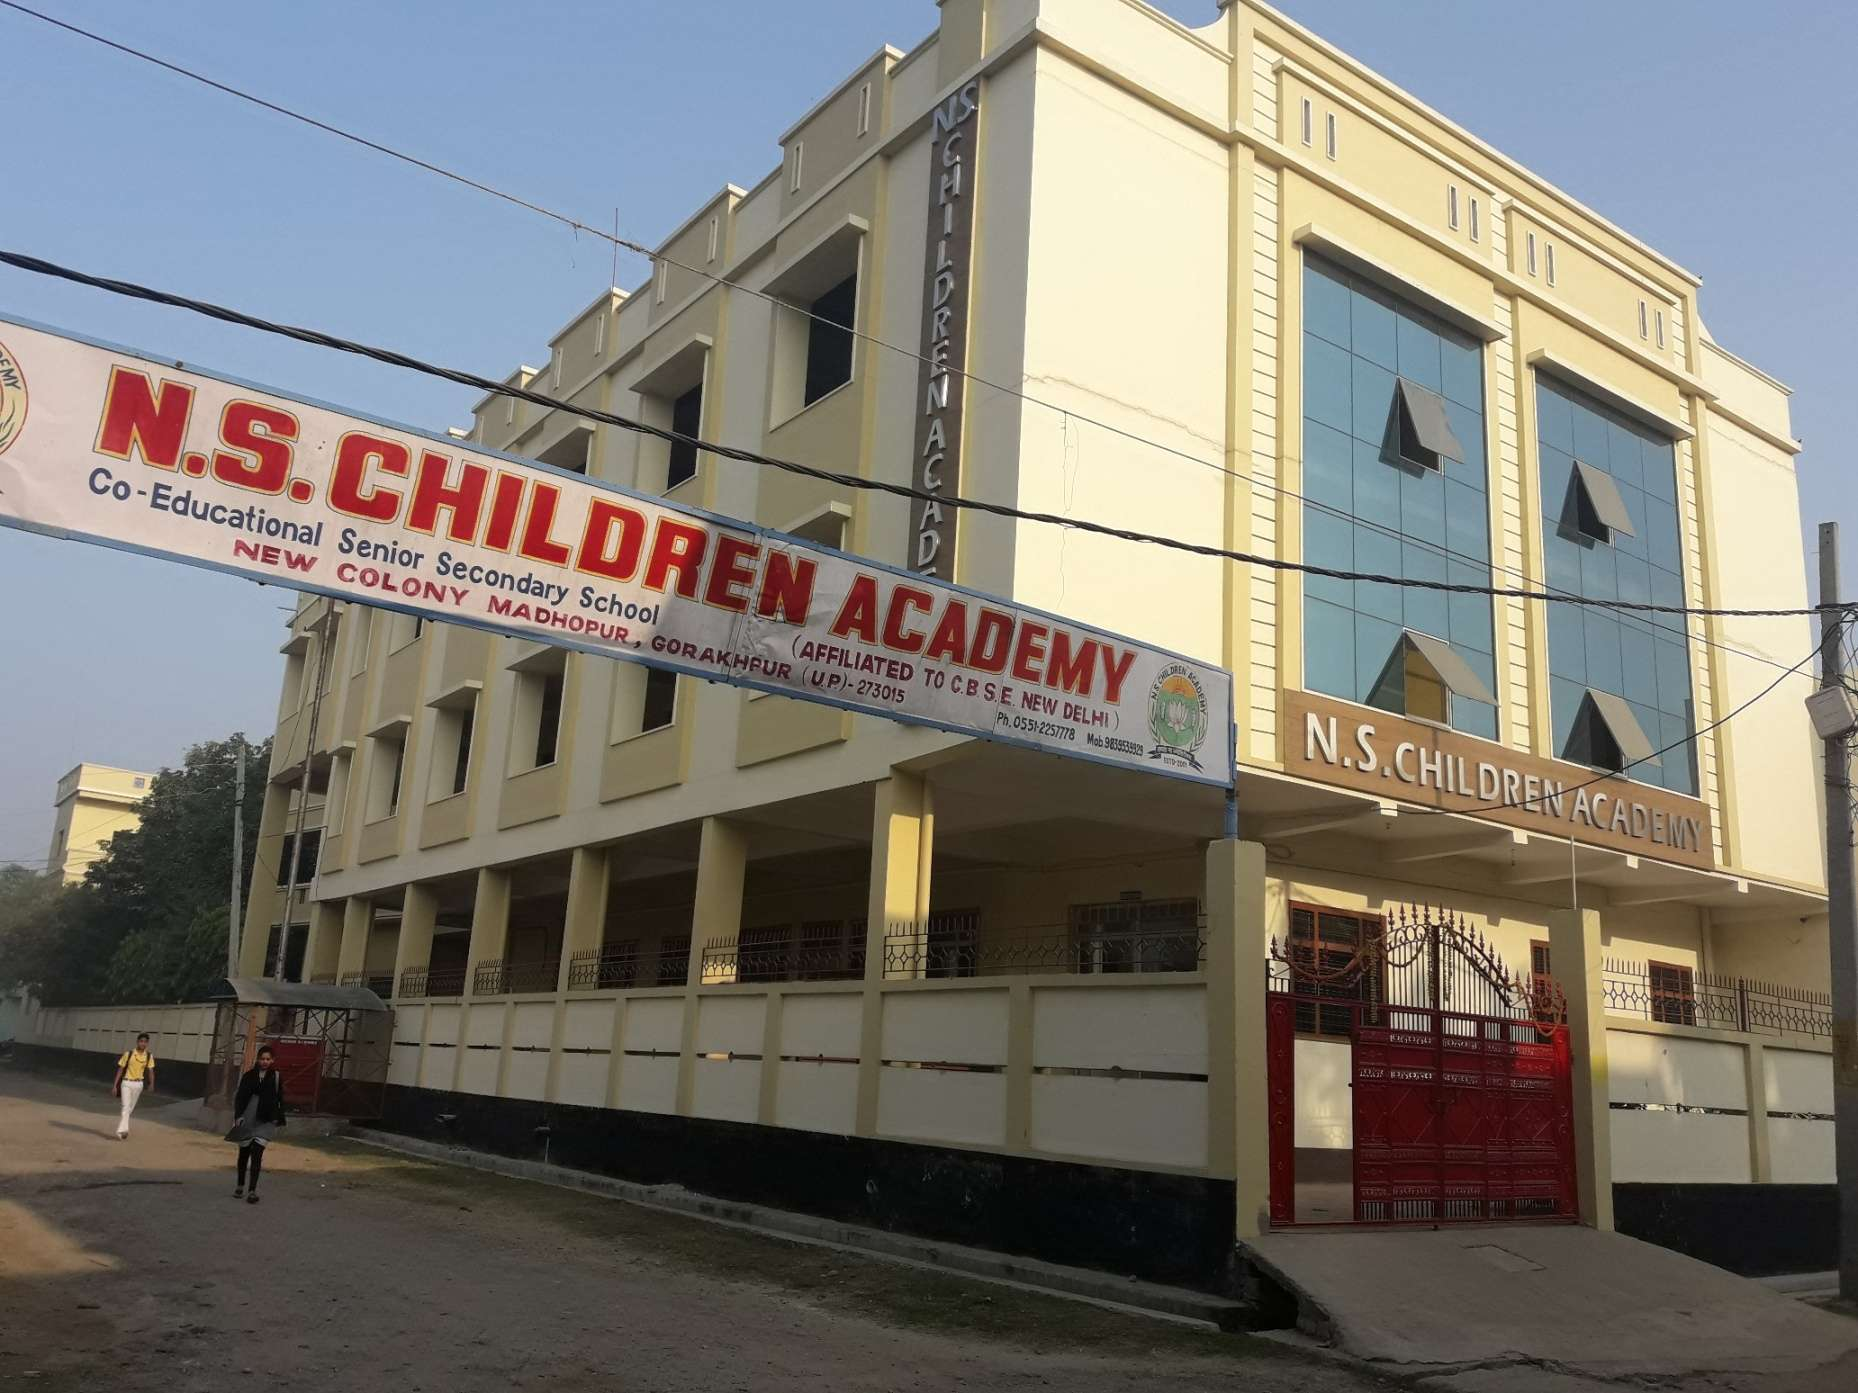 N S CHILDREN ACADEMY NEW COLONY MADOPUR GORAKHNATH GORAKHPUR 2130913